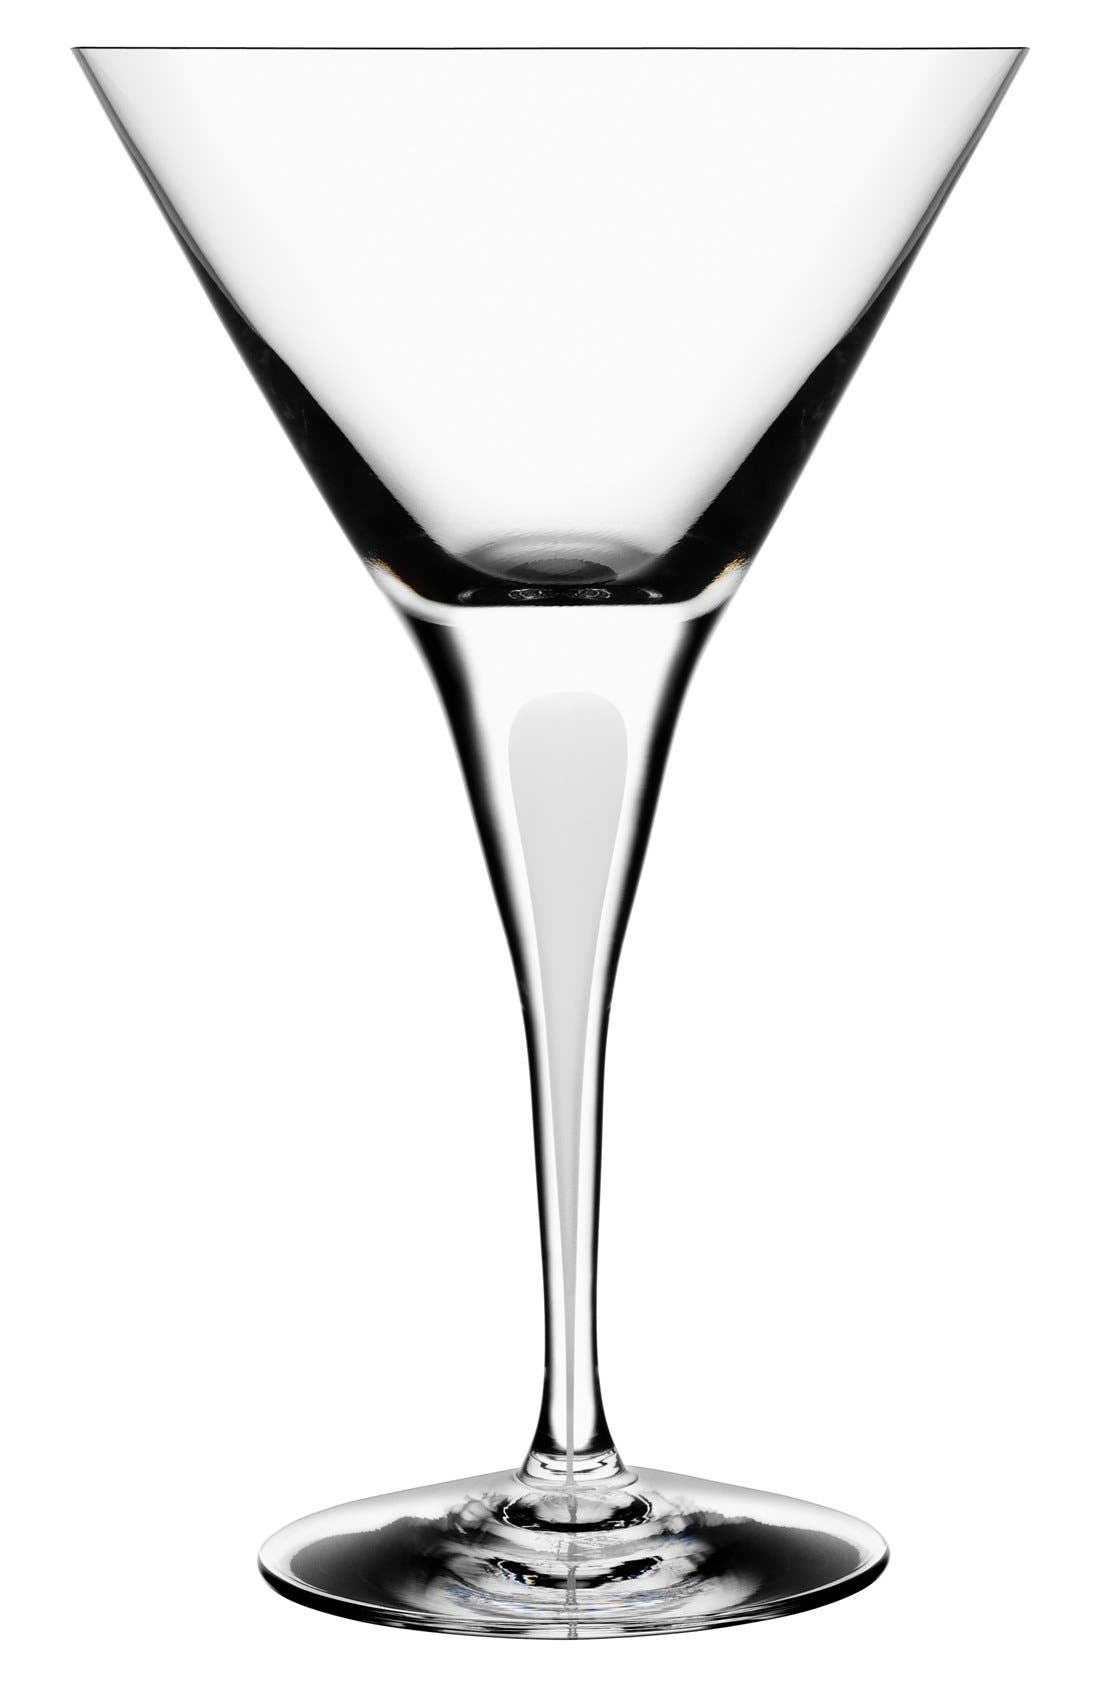 Alternate Image 1 Selected - Orrefors'Intermezzo' Martini Glass